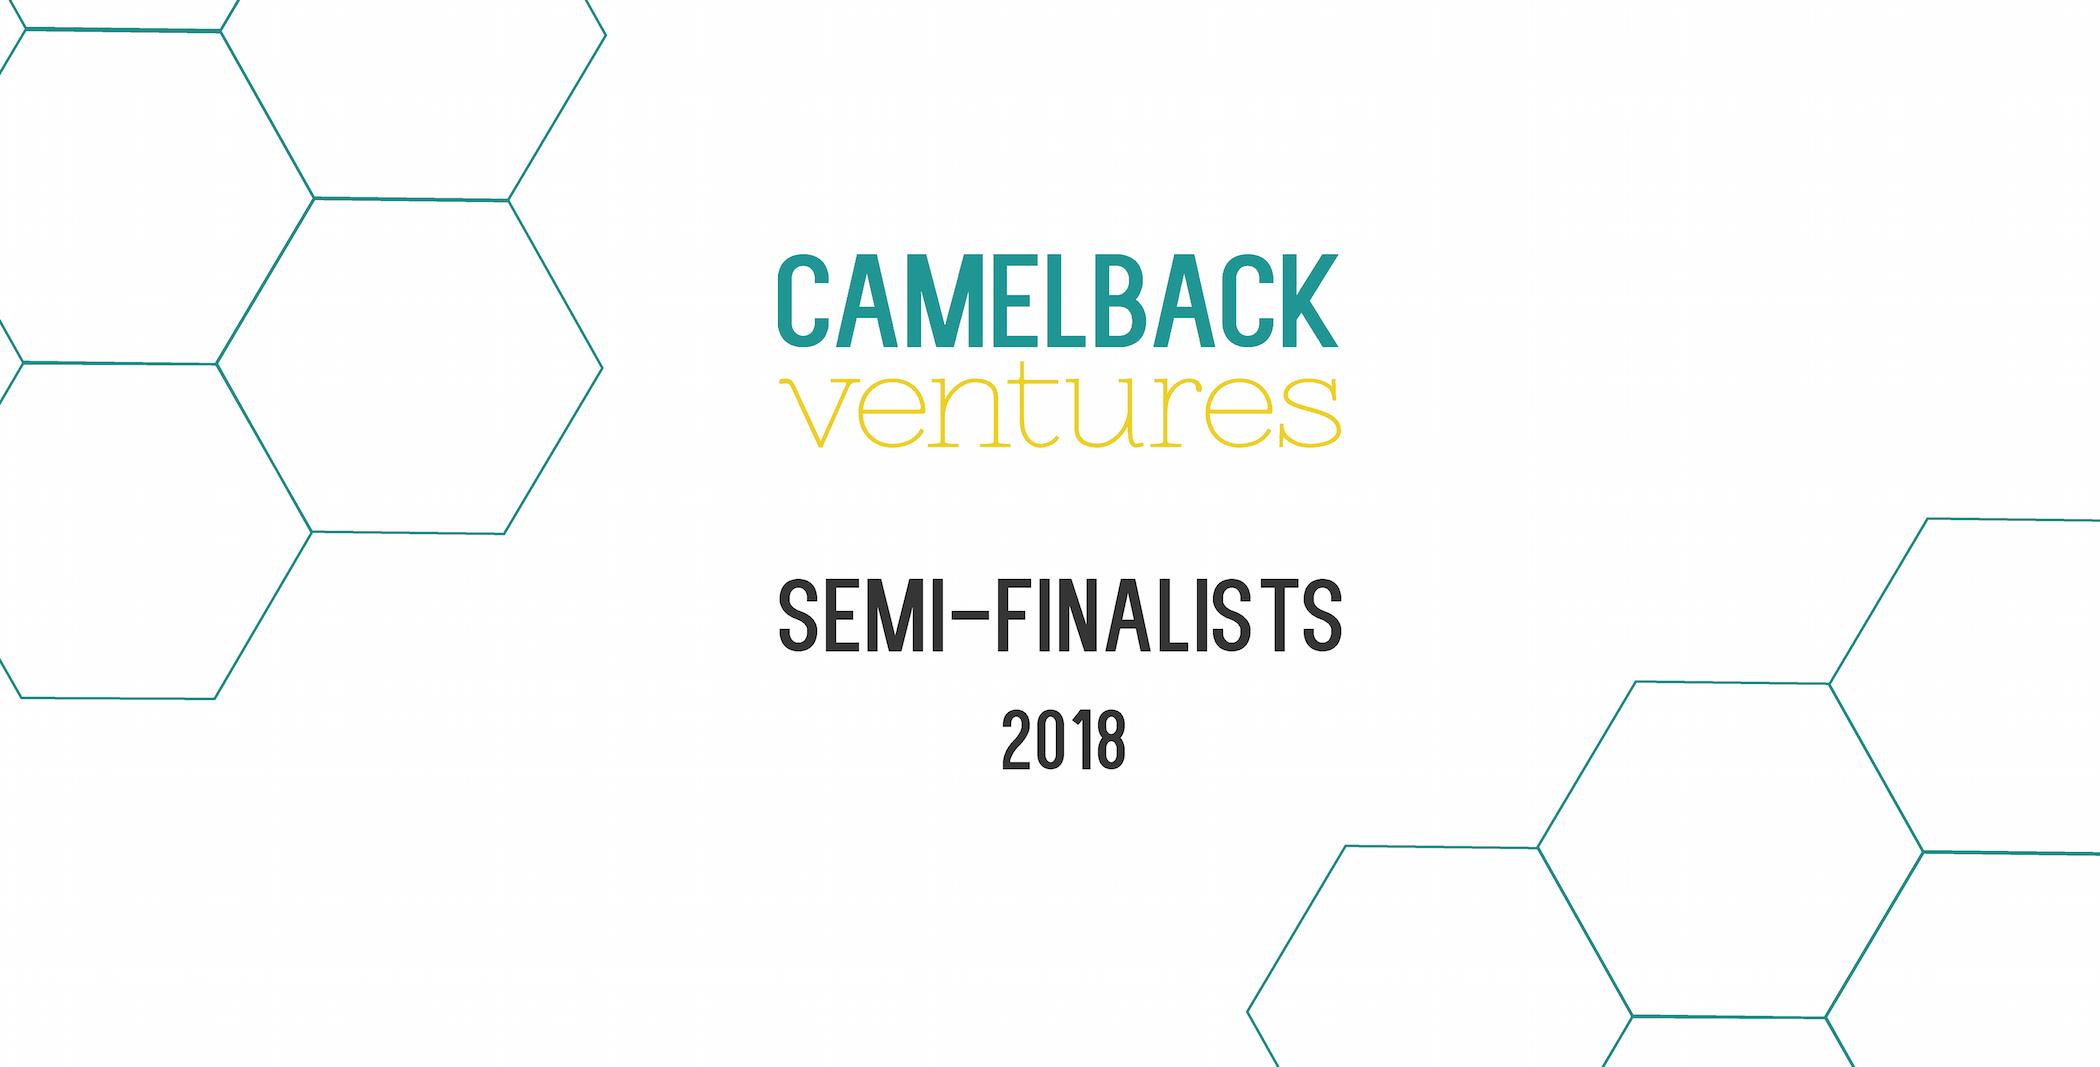 camelback_r12018_tophex__2018_semifinalist title.png